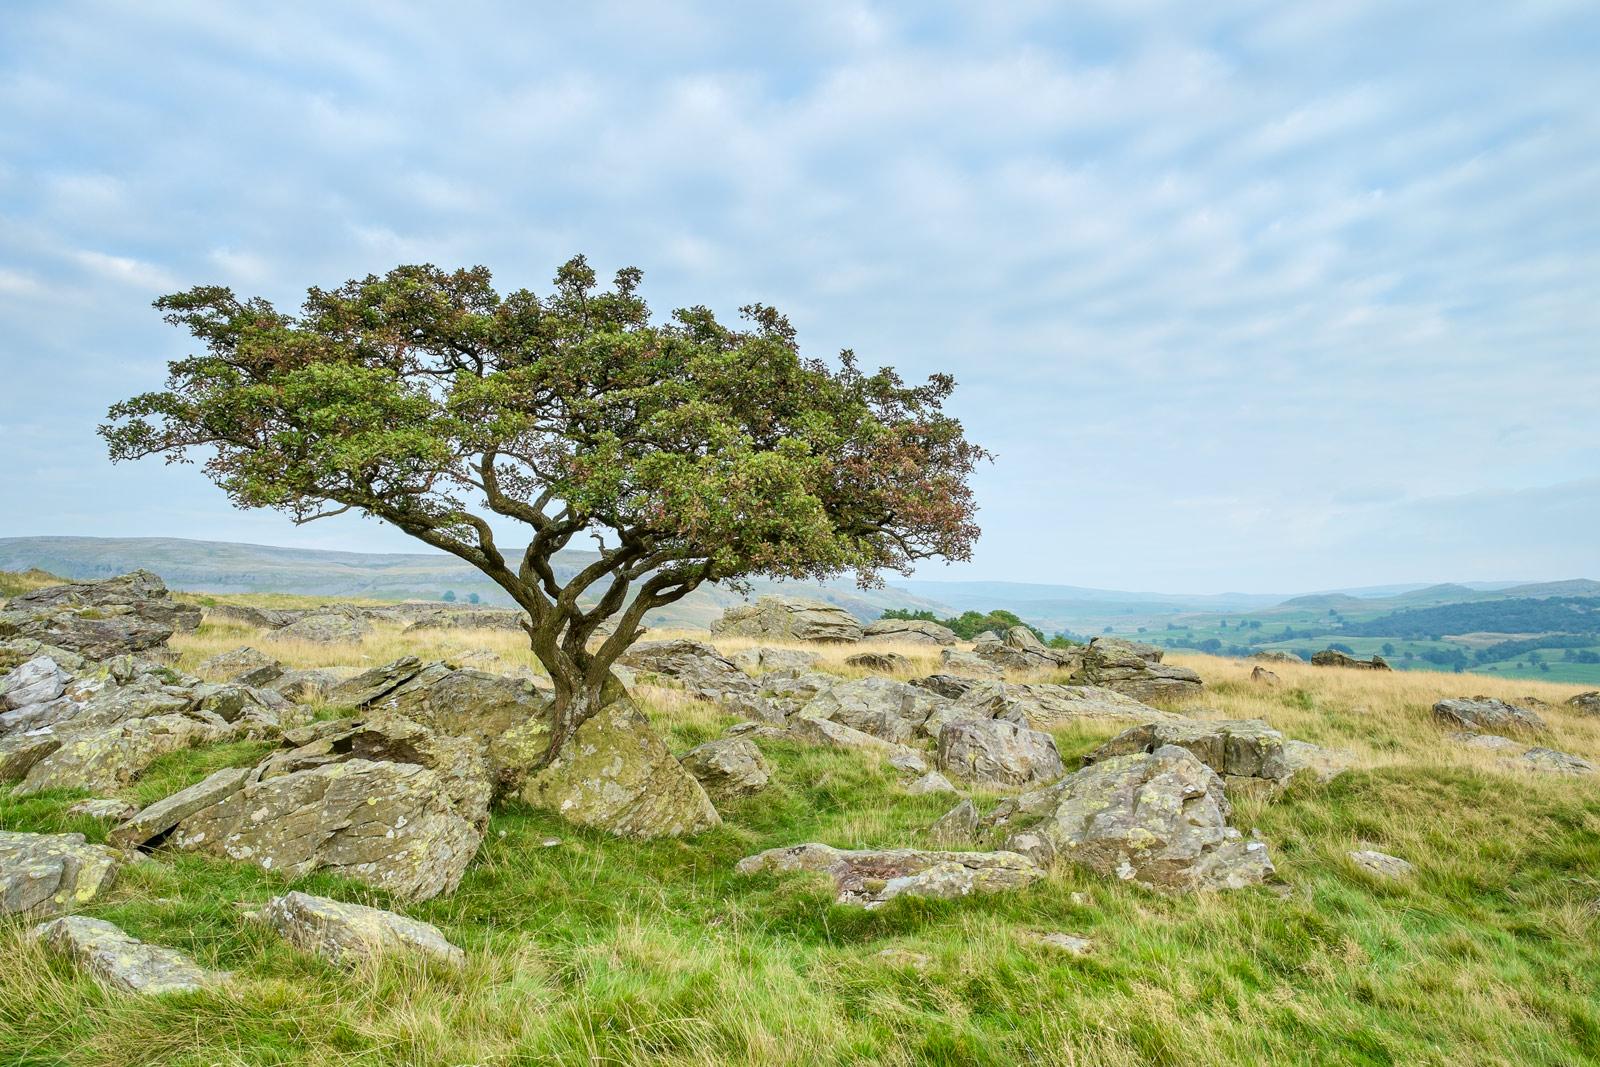 Hawthorn, set amongst the rocks - Norber erratics